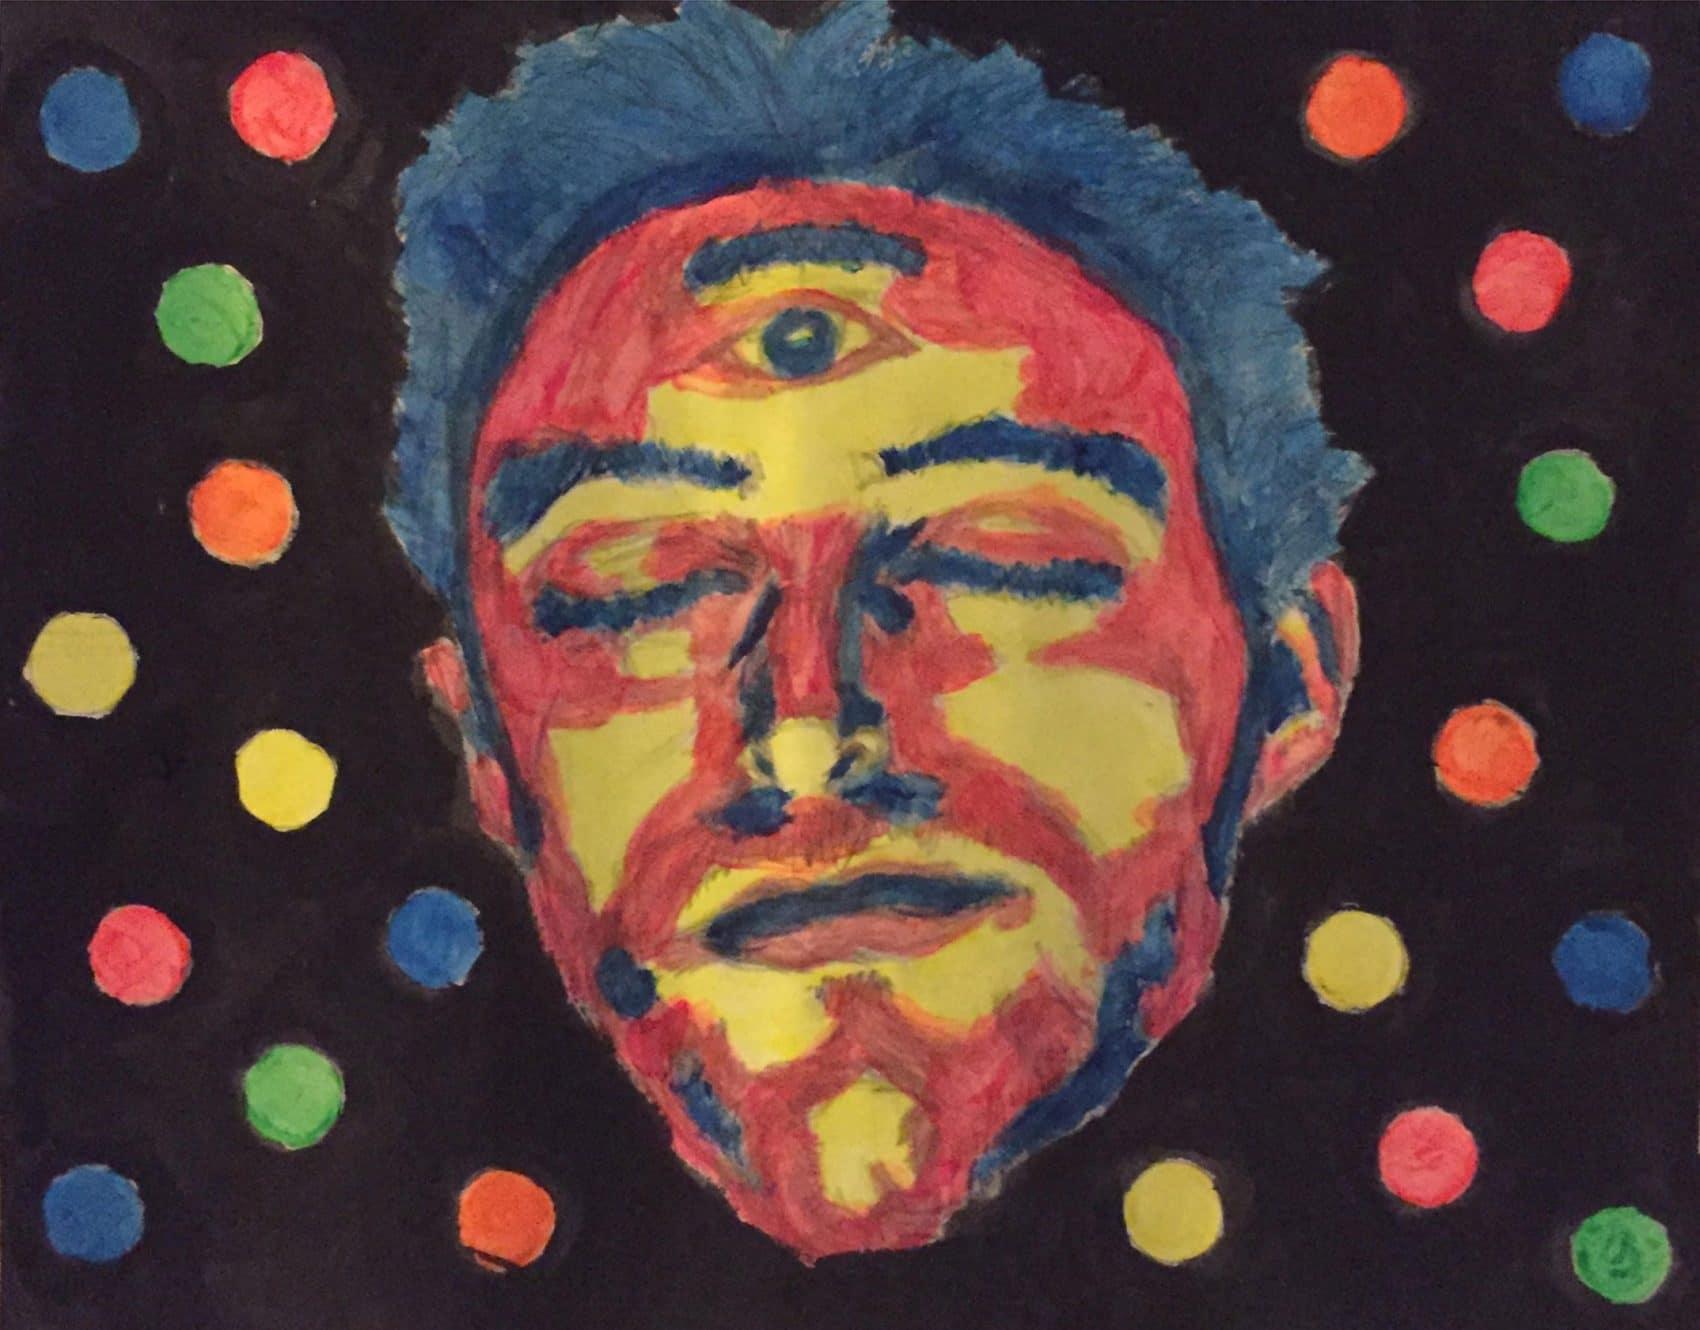 Surrebral- Third Eye cosmic blacklight painting.